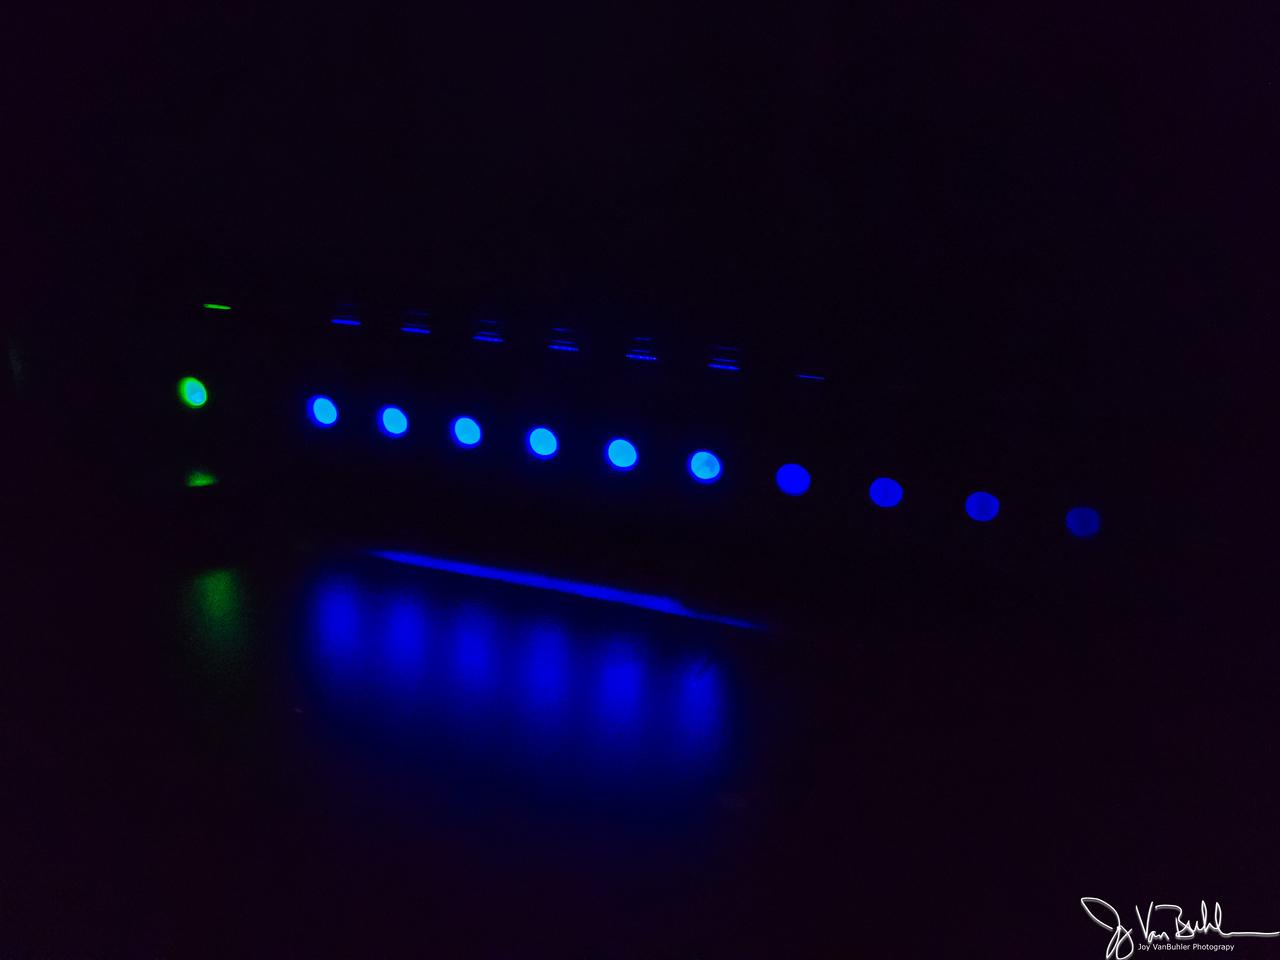 34/365 - Computer lights